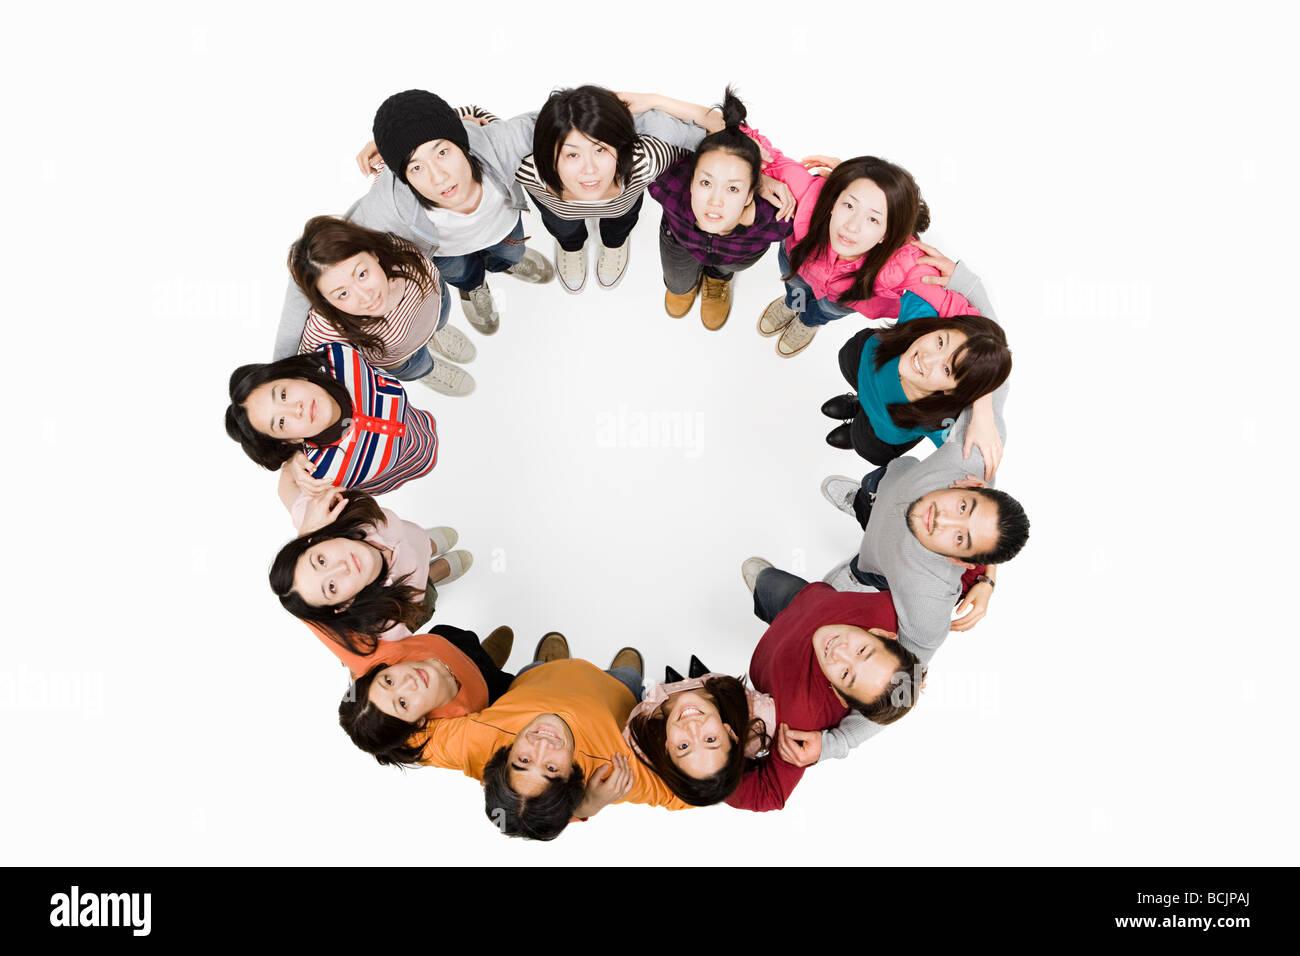 Circle of people - Stock Image